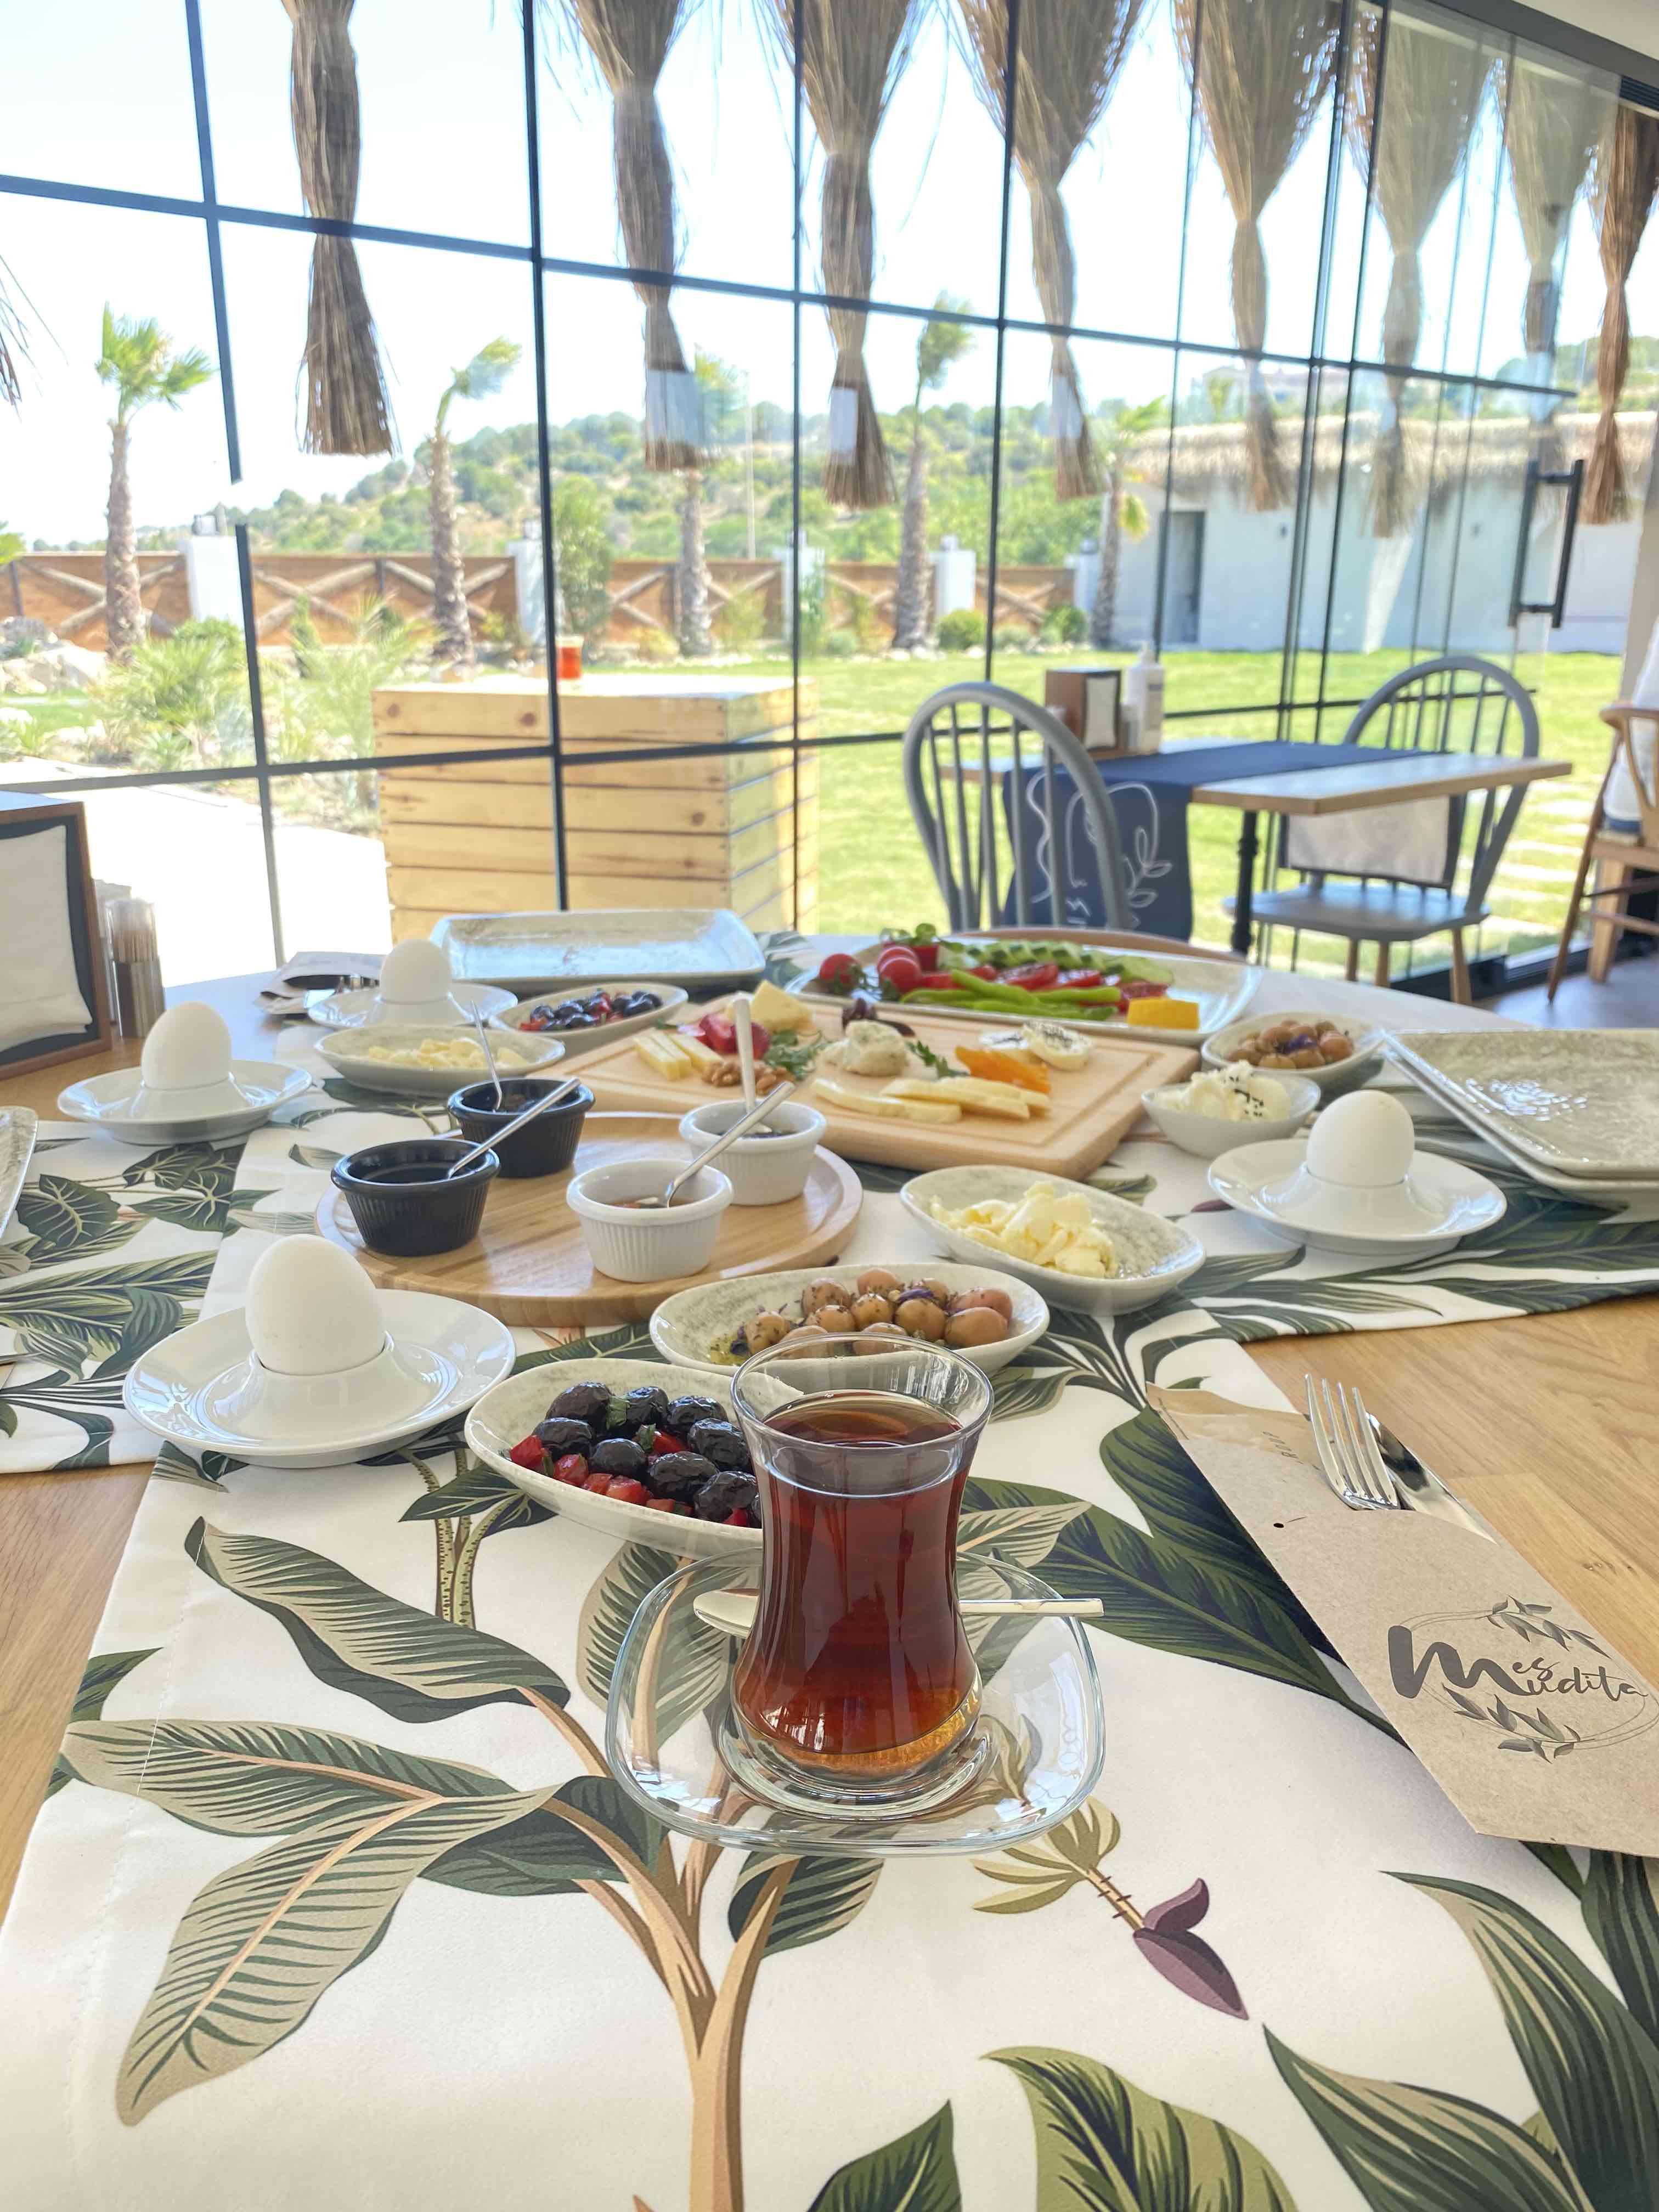 İzmir Mekan Rehberi